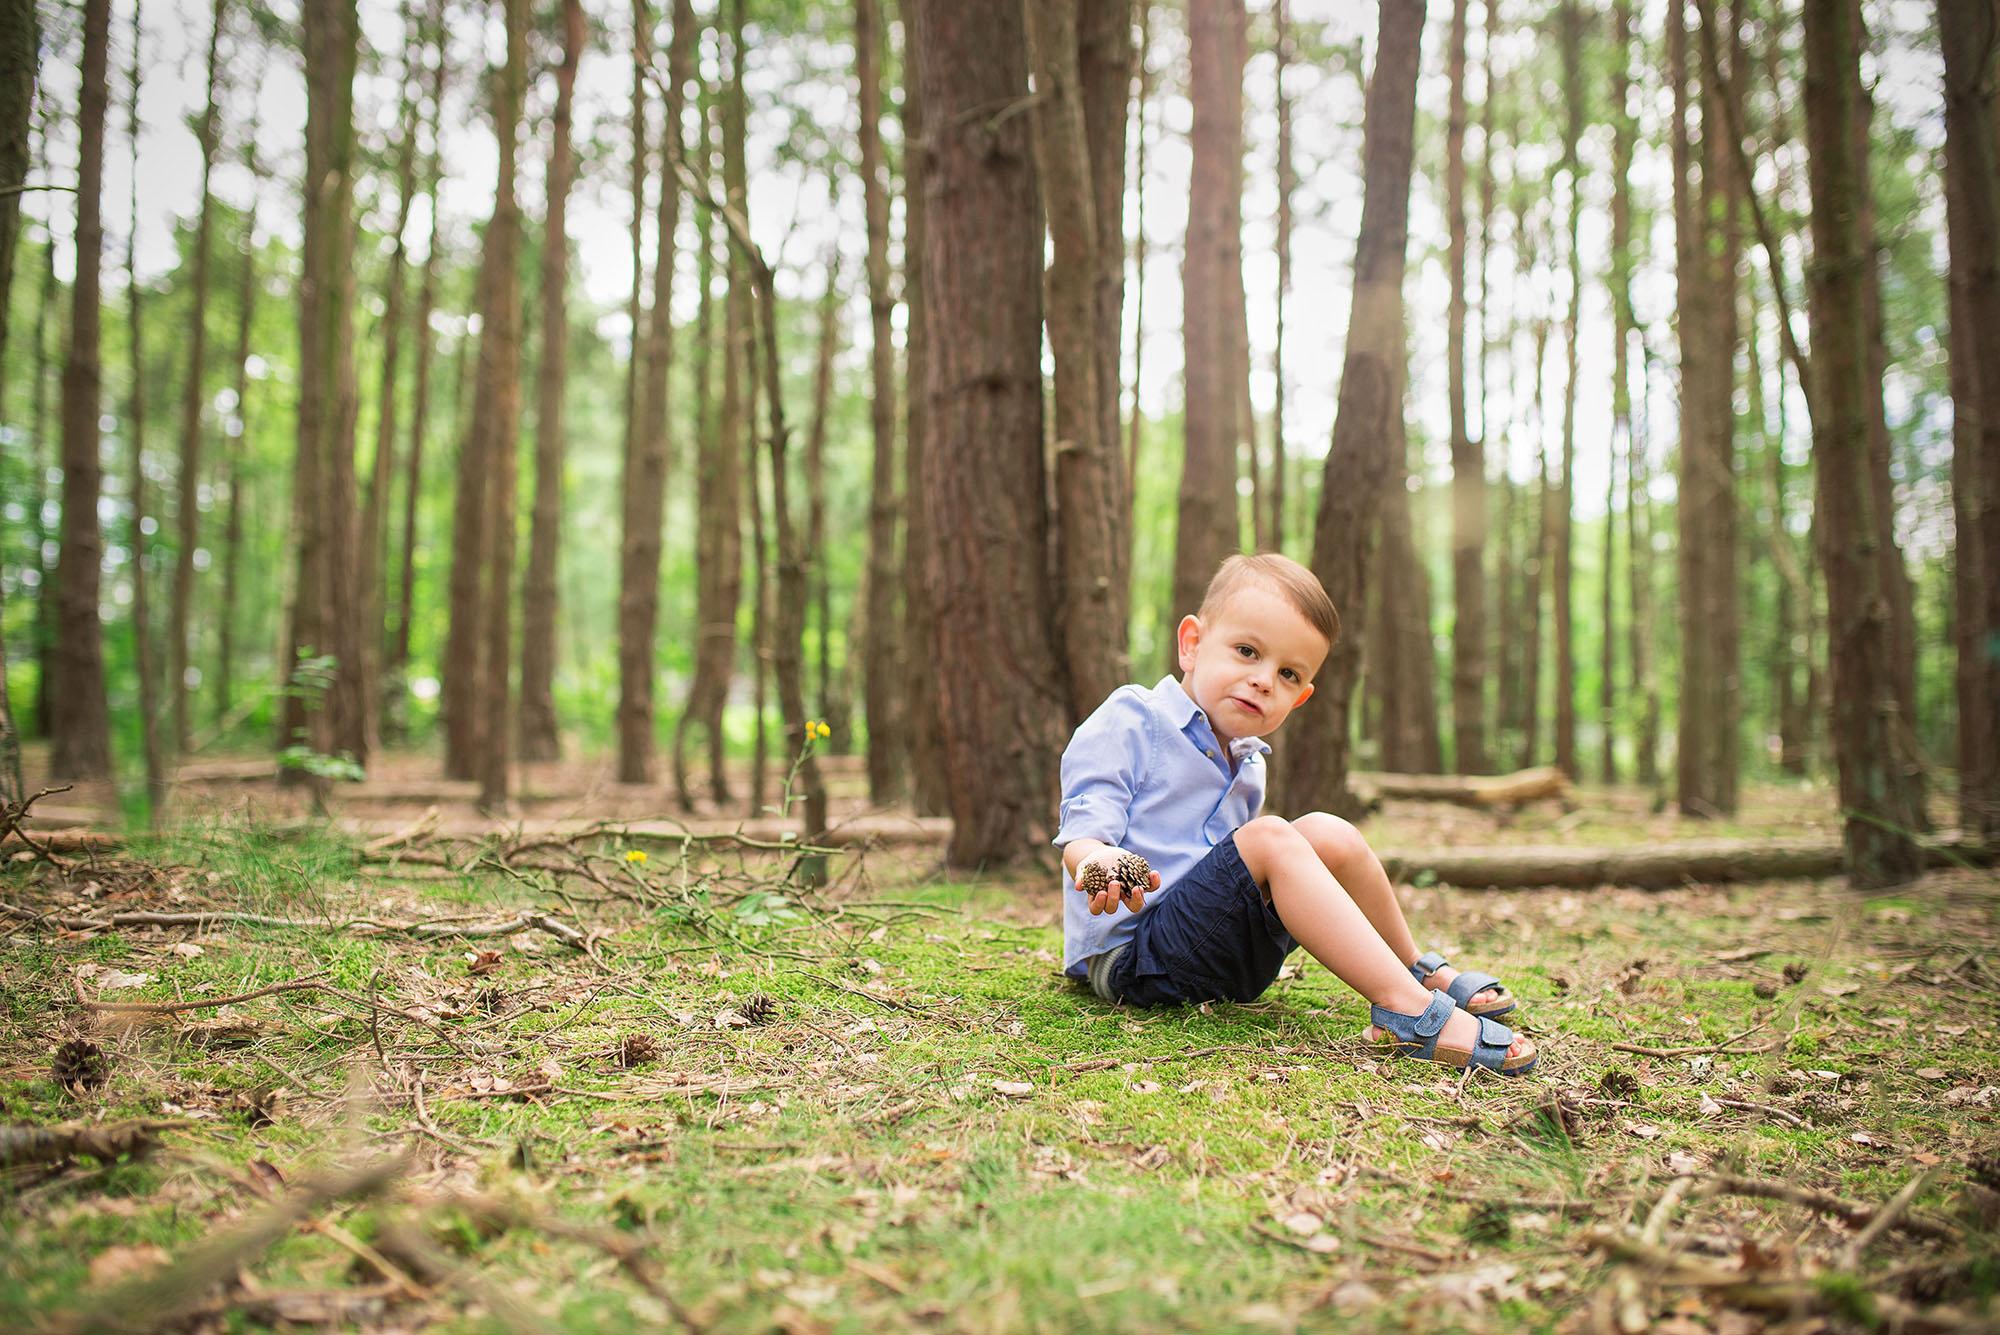 Barnsley family photoshoots, woodland mini